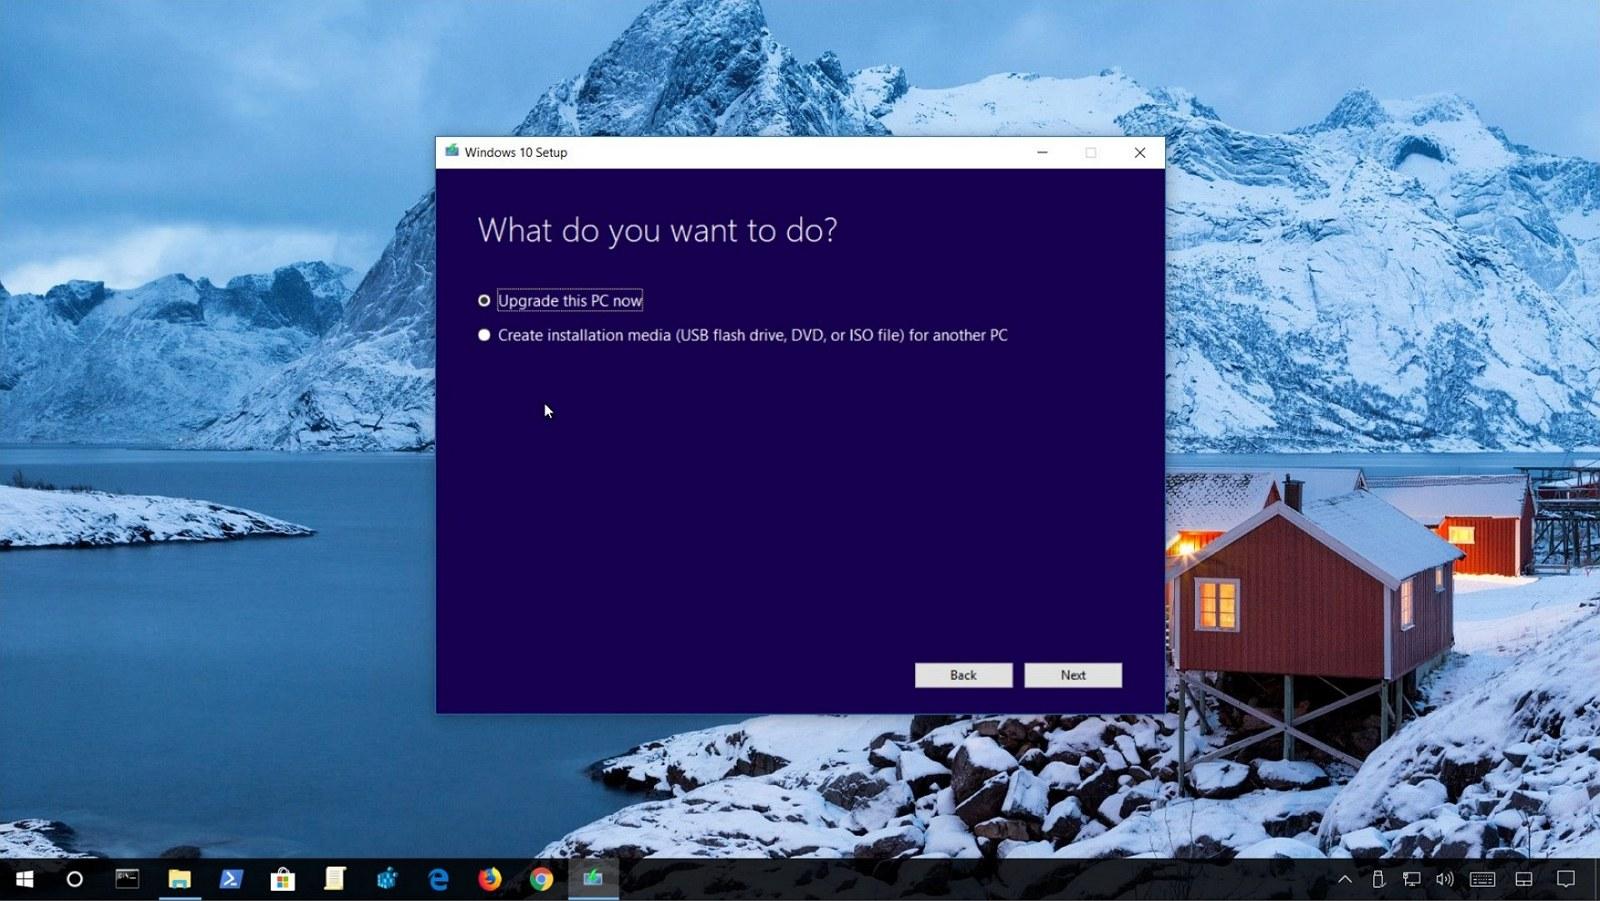 Upgrade to Windows 10 version 1809 (October 2018 Update)